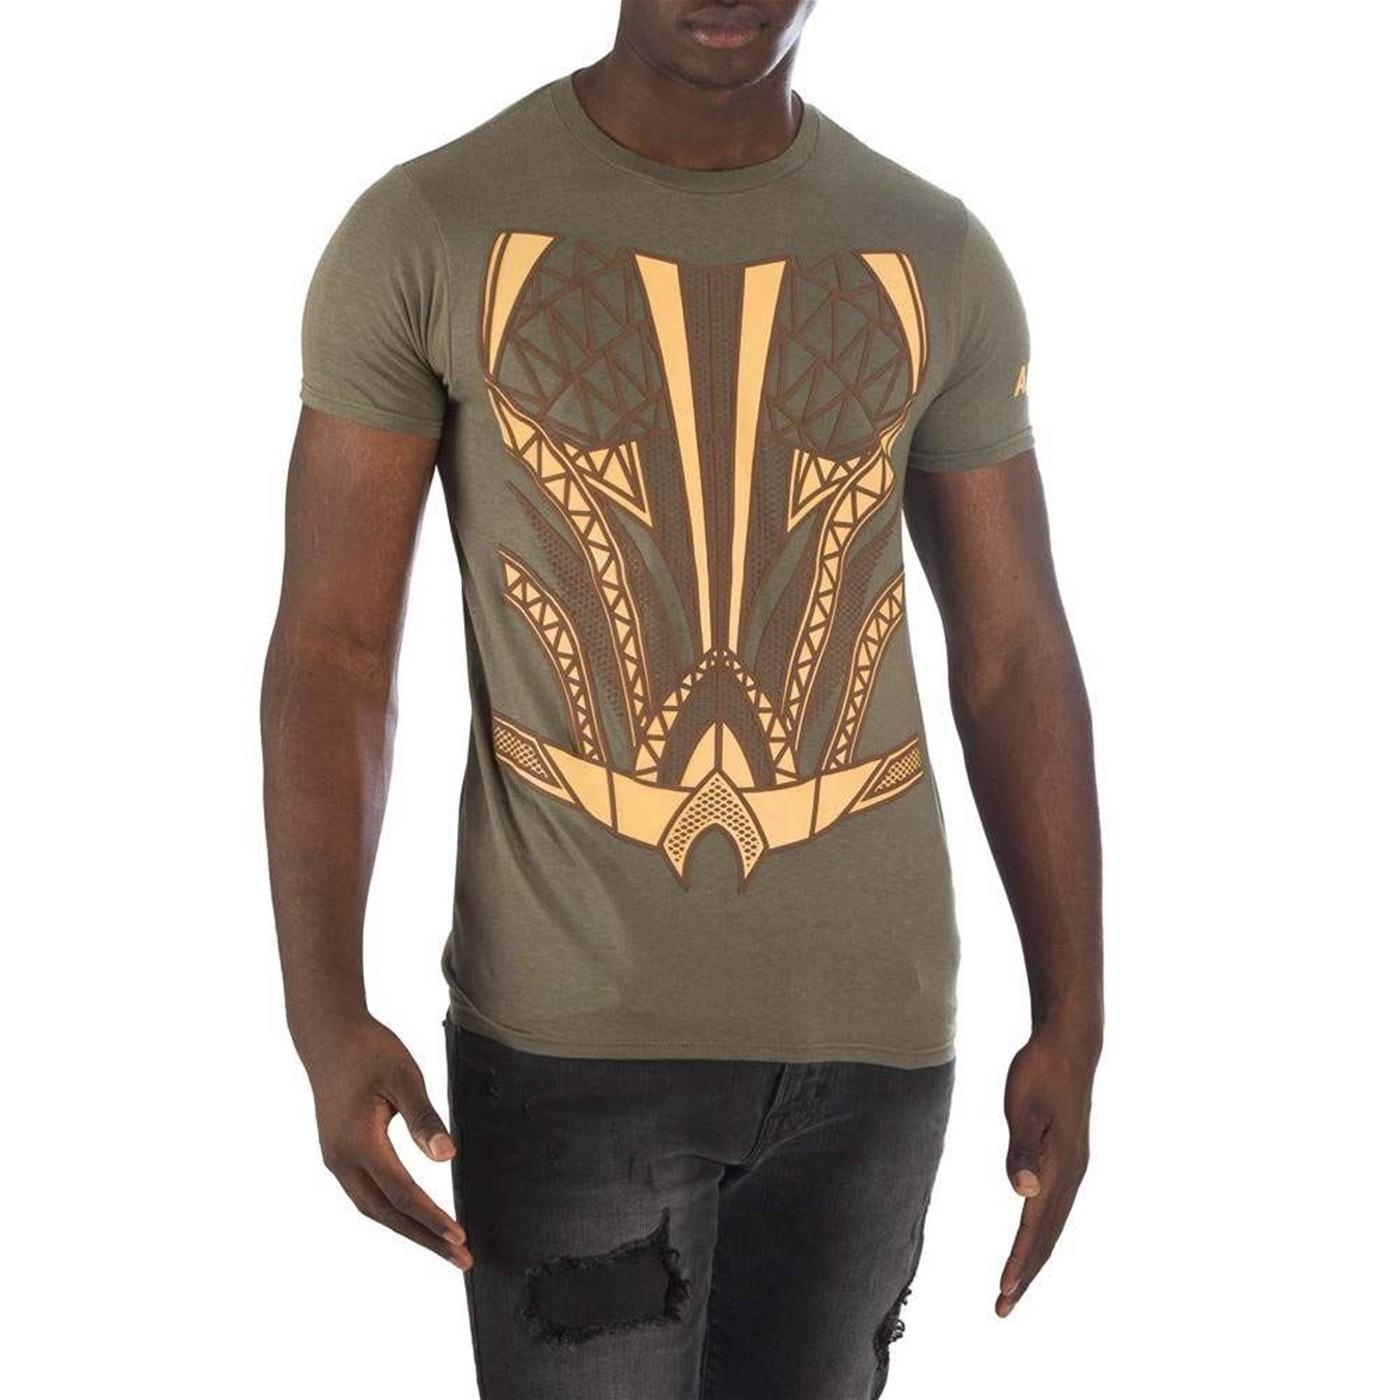 Aquaman Suit Up HD Men's Character Costume Men's T-Shirt